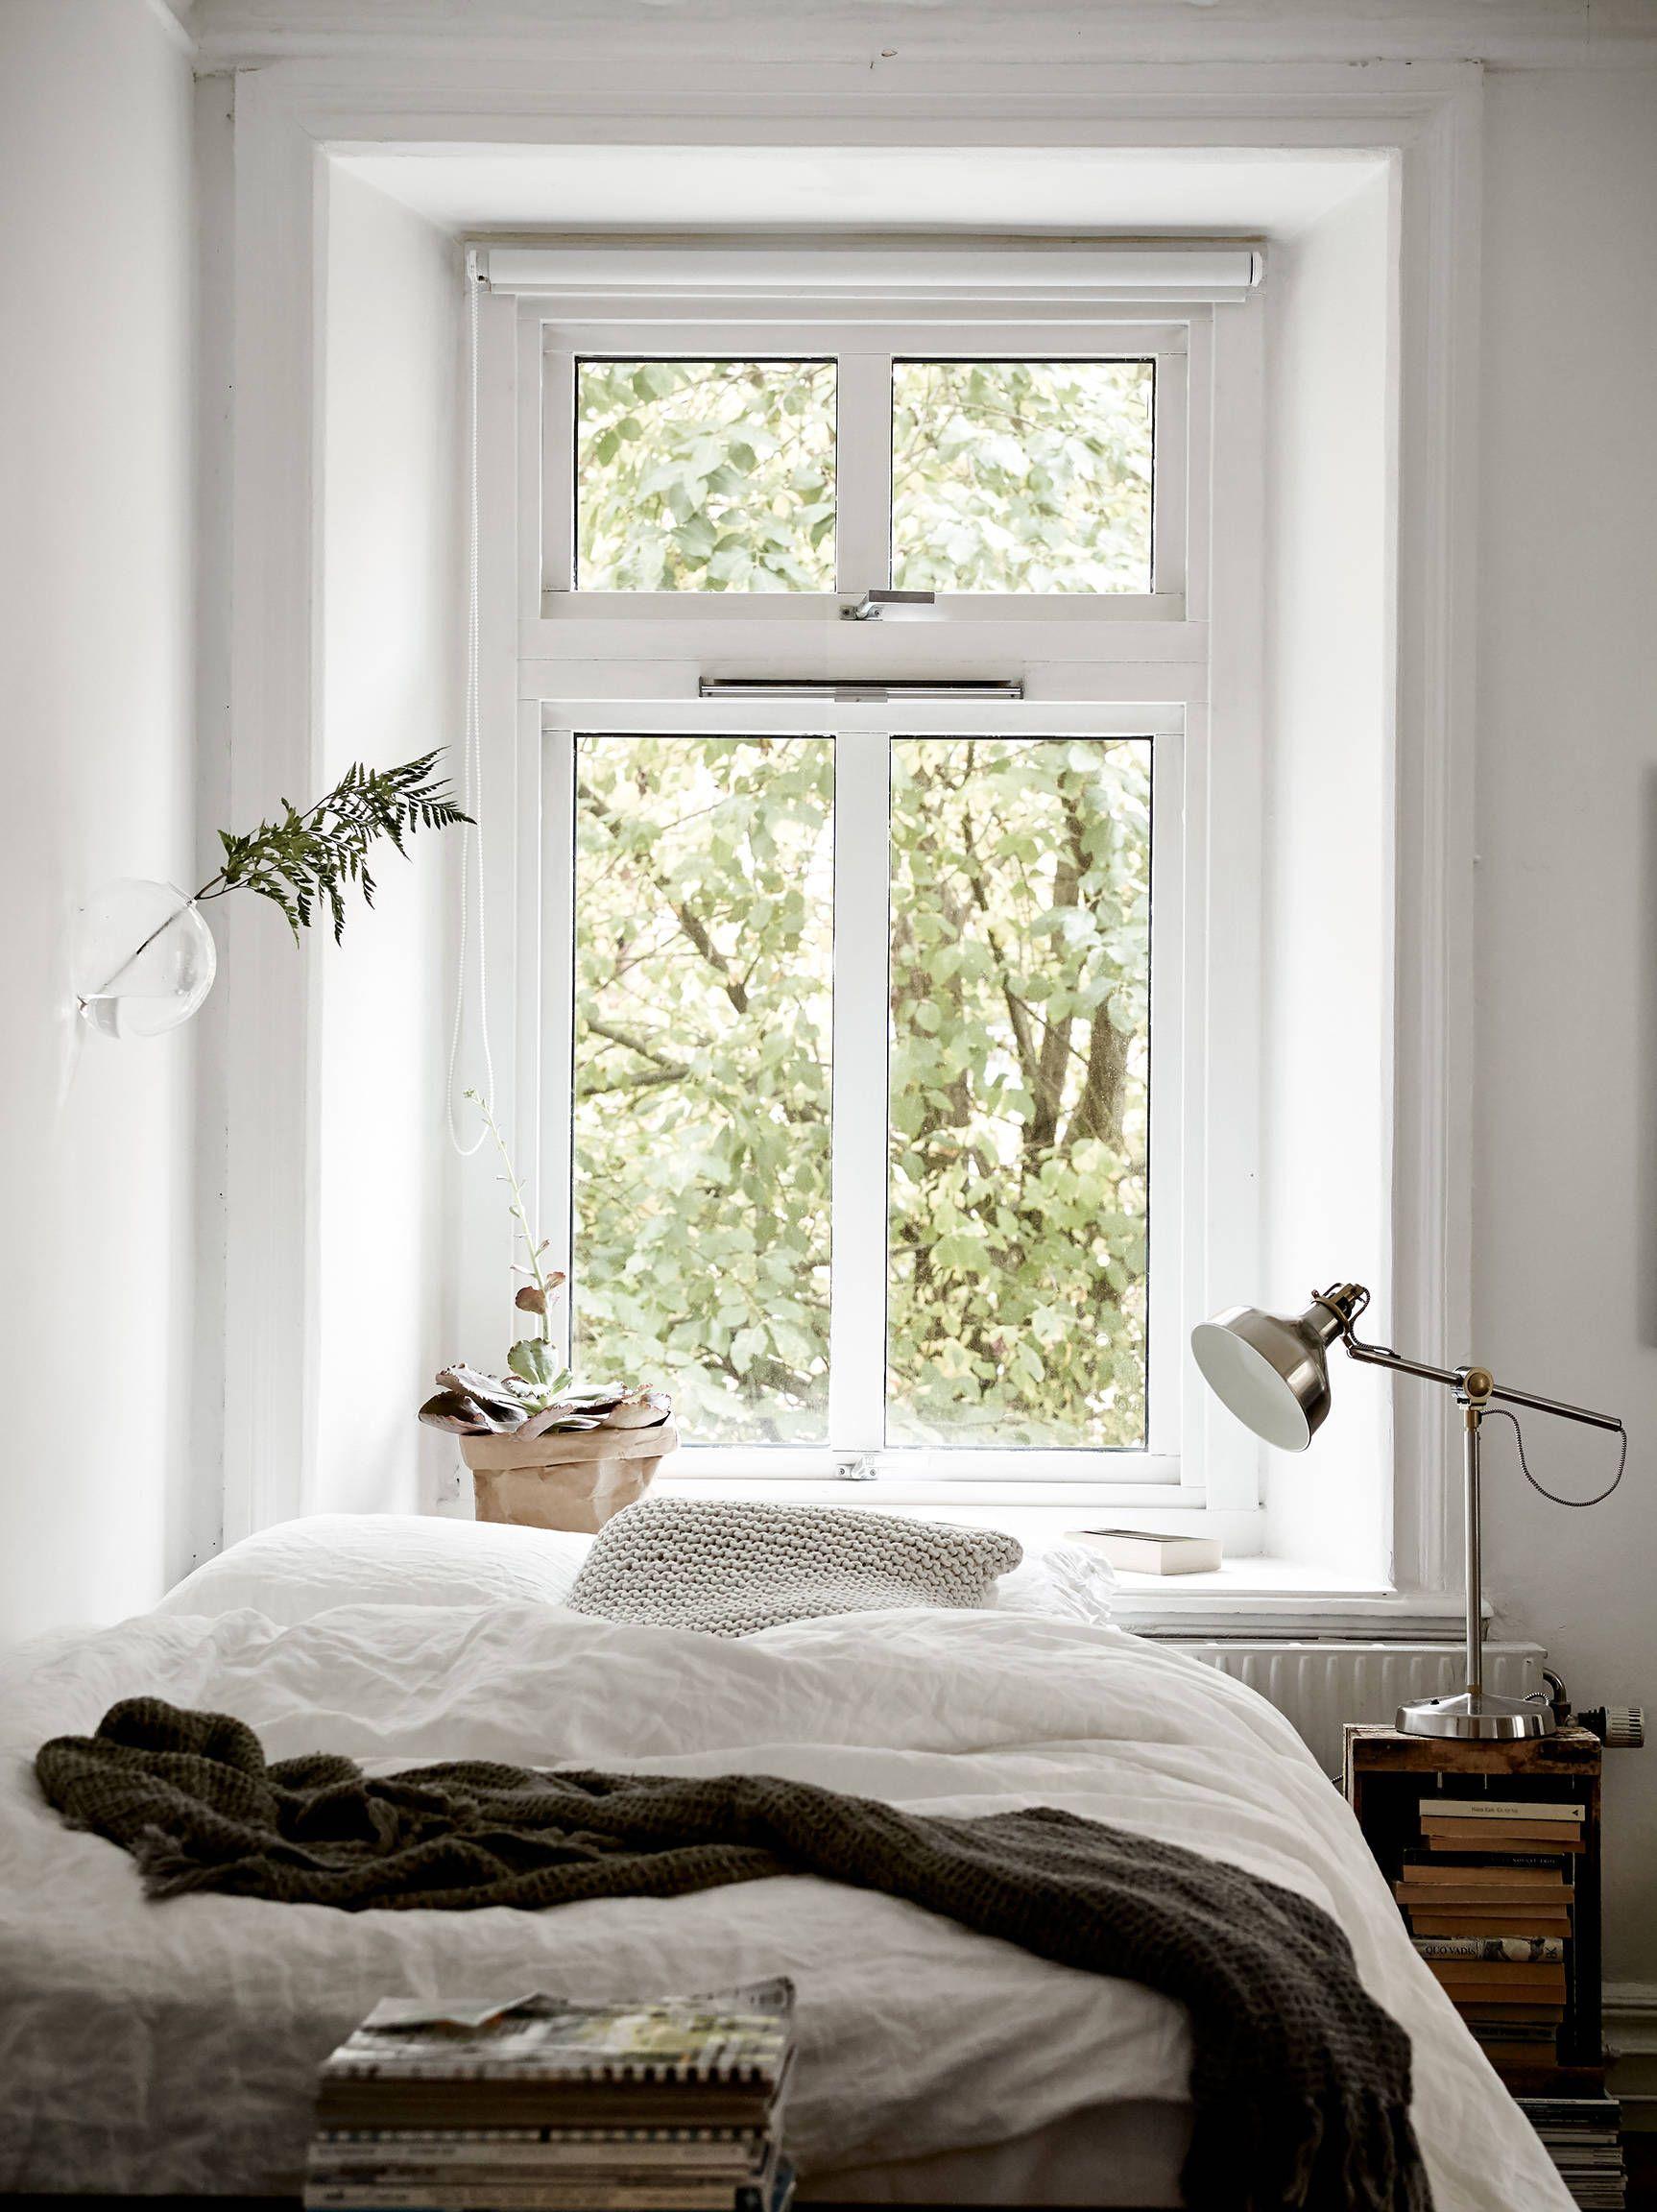 Ovre Majorsgatan 4 B One Room Flat Cozy Small Bedrooms Tiny Bedroom